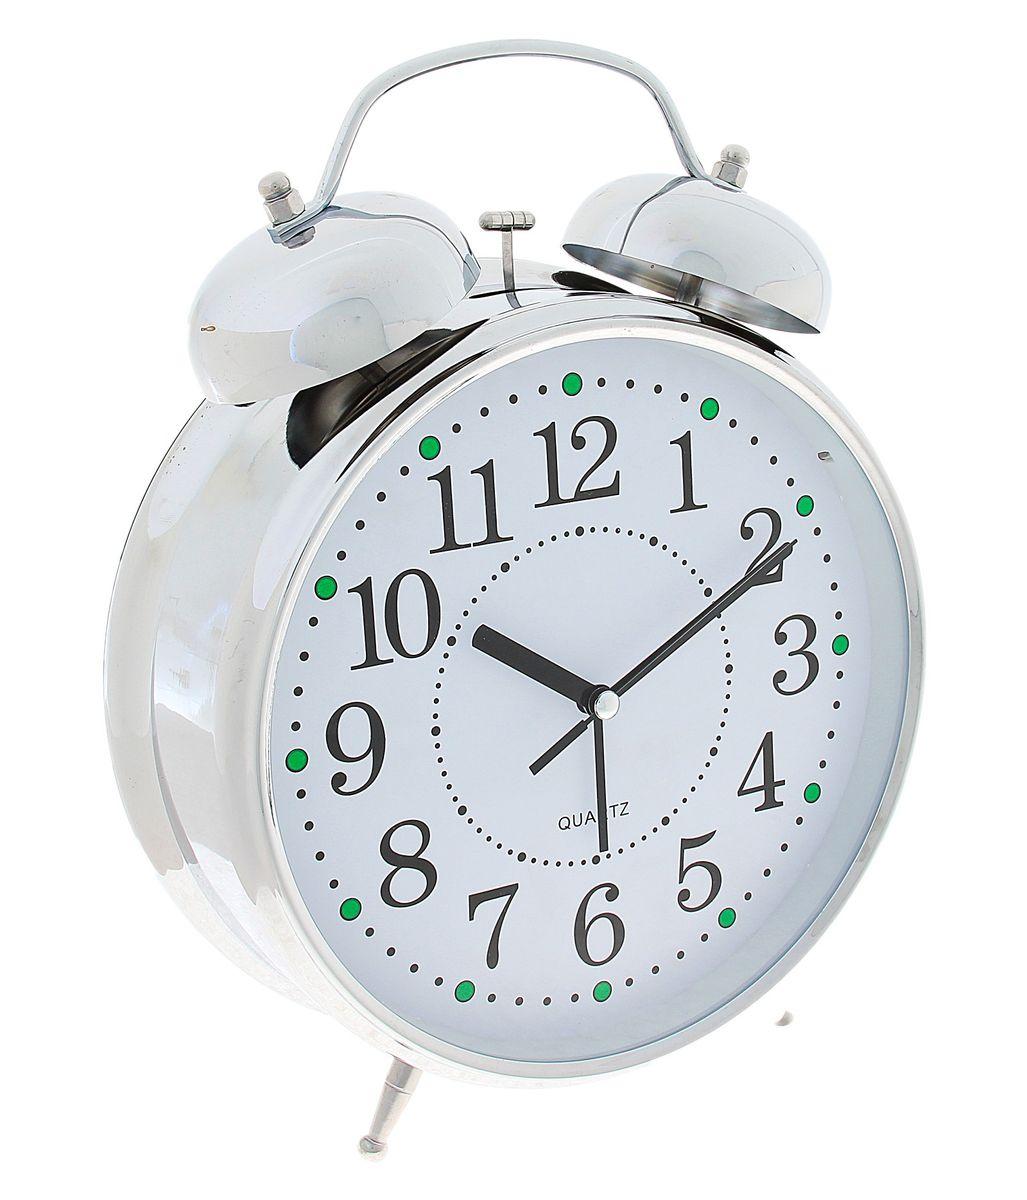 Часы-будильник Sima-land Классика, цвет: белый, серебристый, диаметр 20 см часы будильник sima land жду встречи